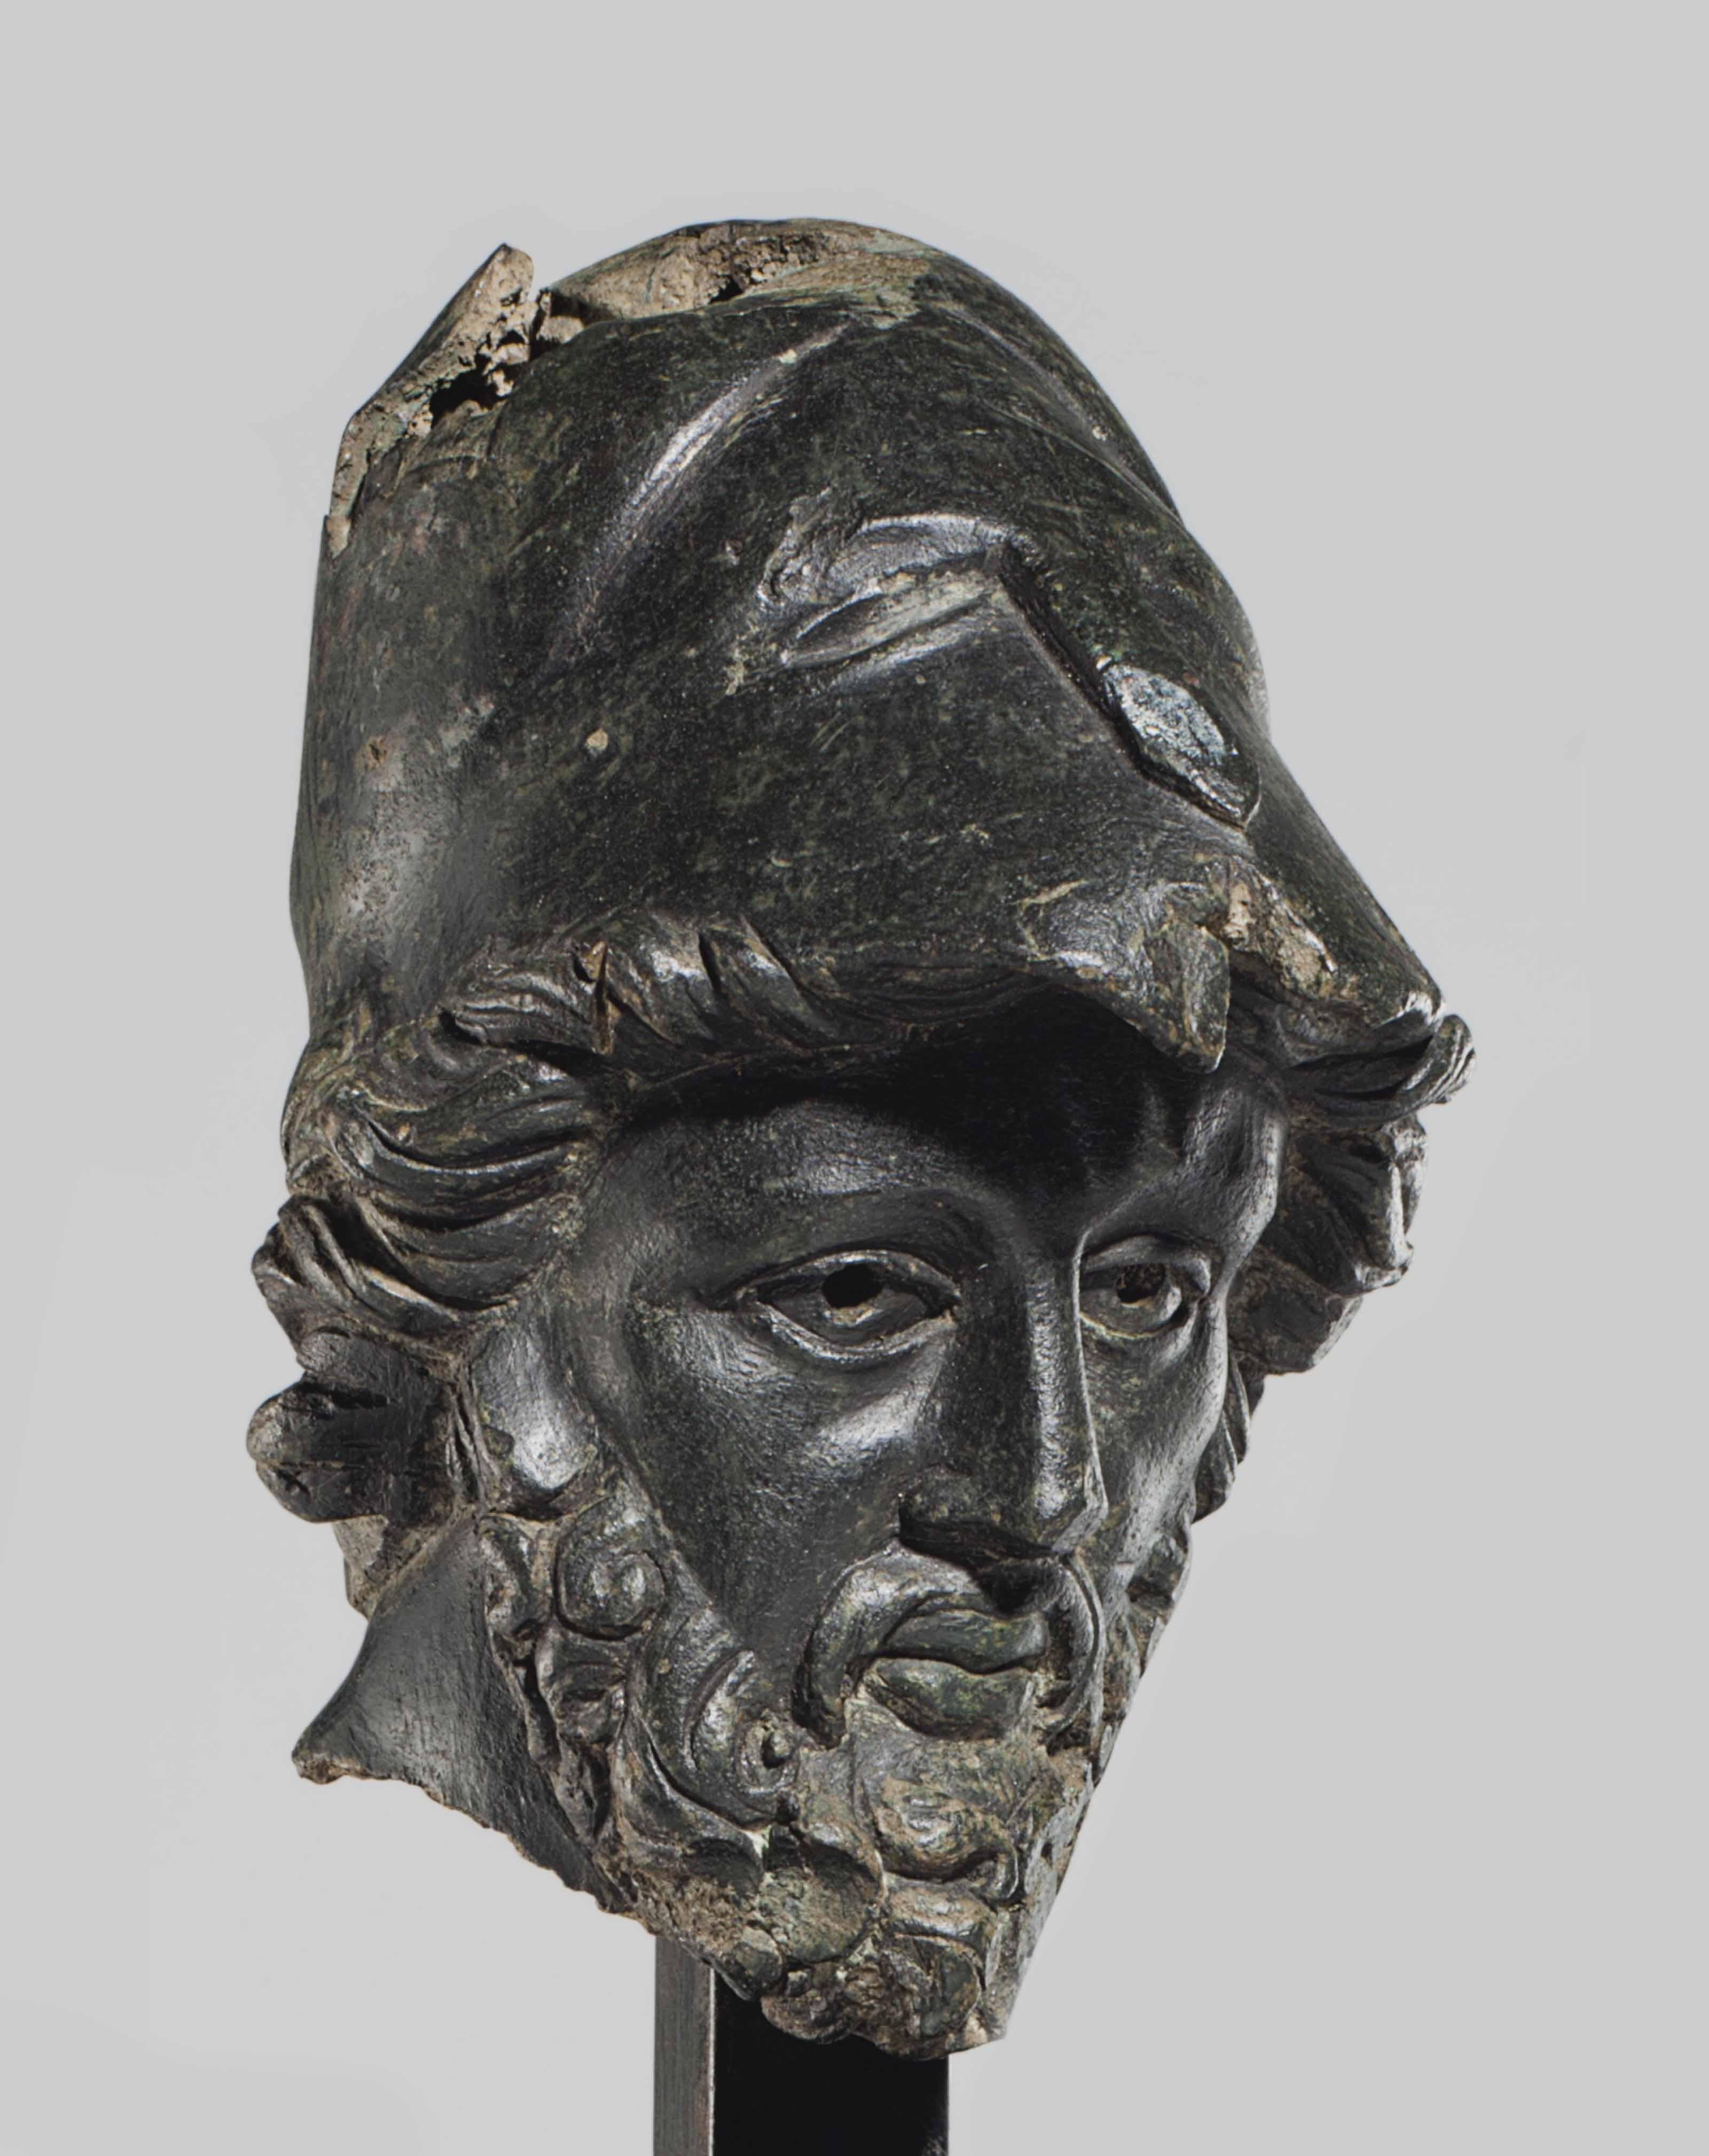 A ROMAN BRONZE HELMETED HEAD